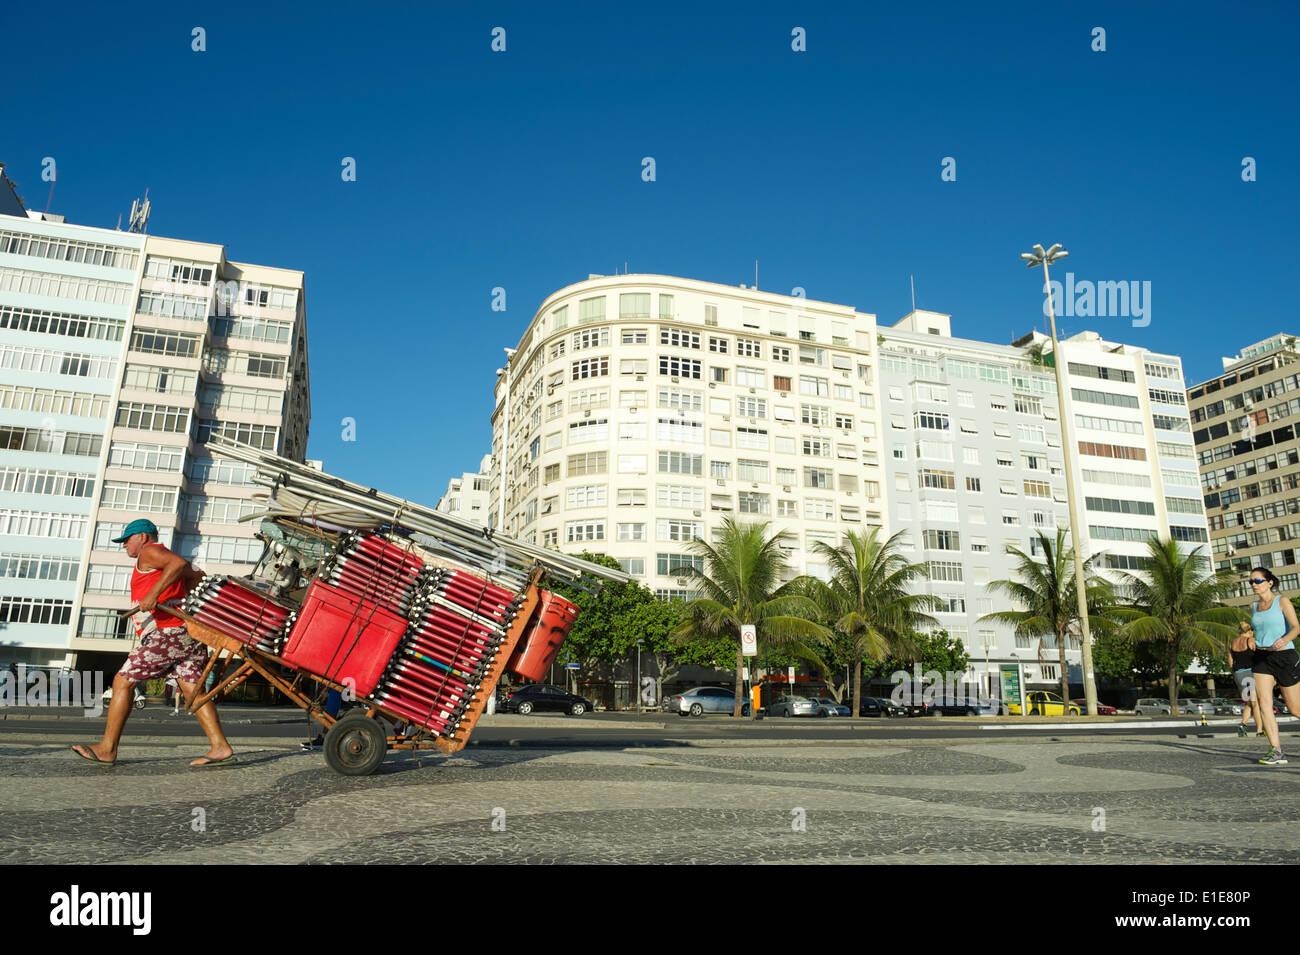 RIO DE JANEIRO, BRAZIL - FEBRUARY 07, 2014: Brazilian man pulls a cart loaded with beach chairs along the Copacabana boardwalk. - Stock Image